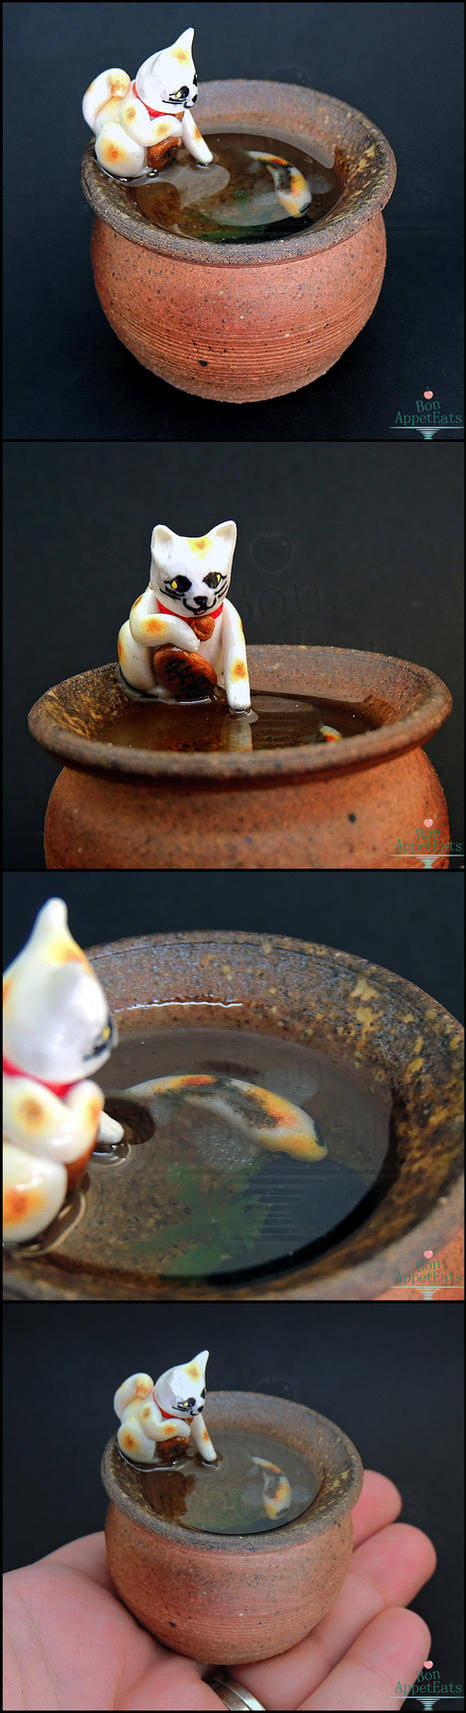 Commission: Maneki Neko Koi Pond Pottery by Bon-AppetEats